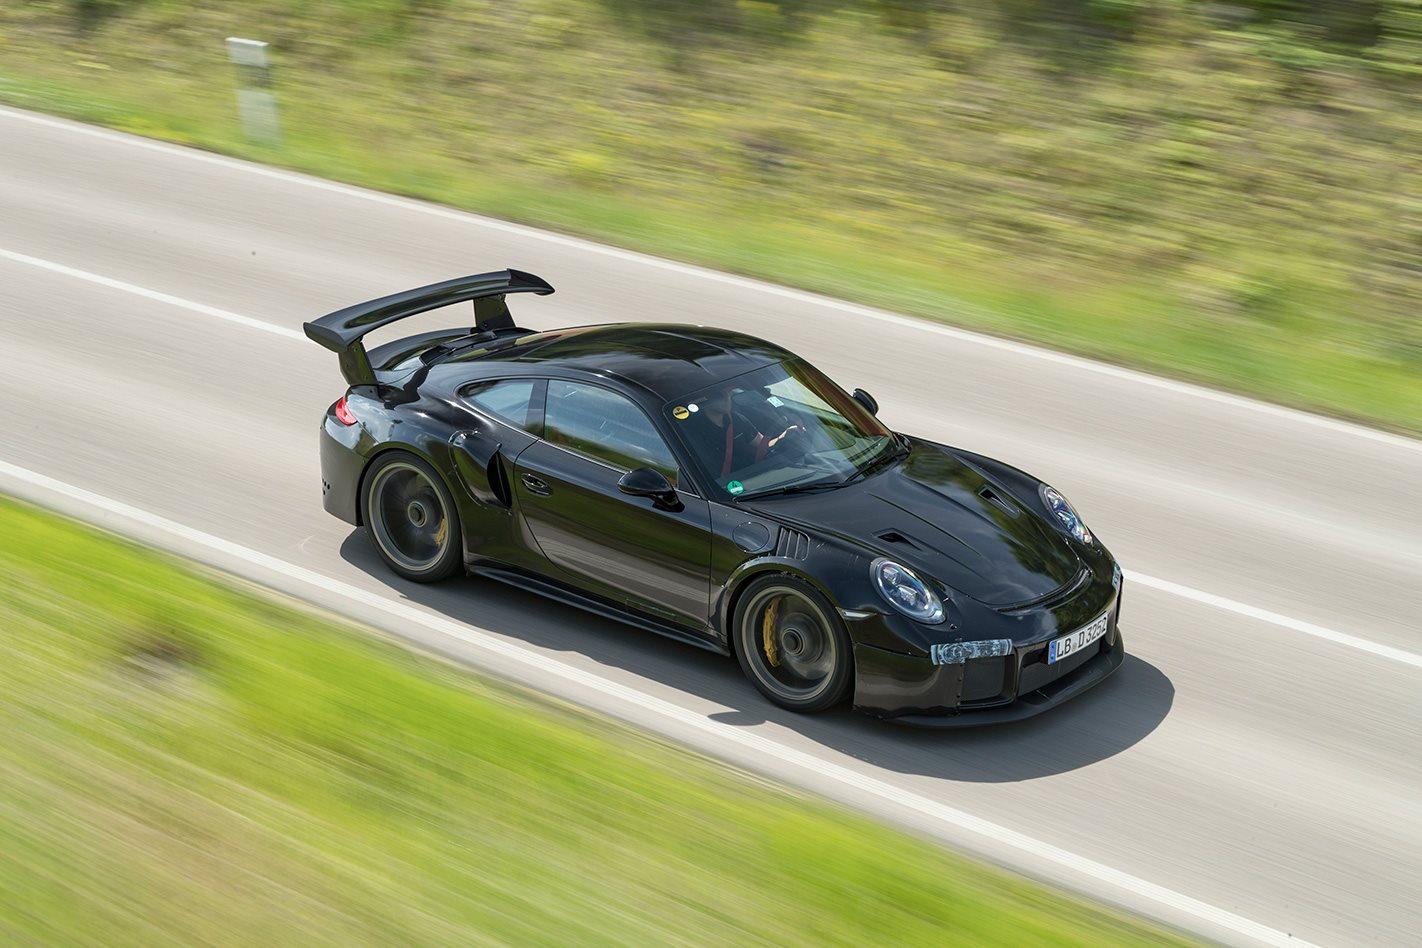 2018 porsche 911 gt2 rs ridealong motor. Black Bedroom Furniture Sets. Home Design Ideas